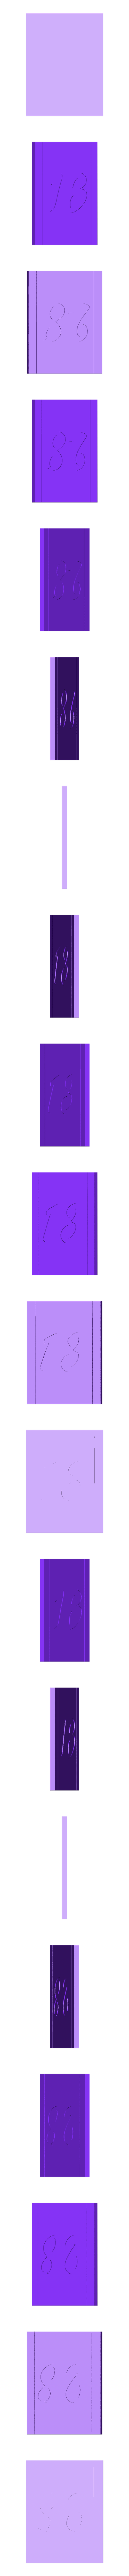 13_-_28.stl Download free SCAD file Perpetual Flip Calendar (W/ Customizable Font) • 3D printable model, Dsk